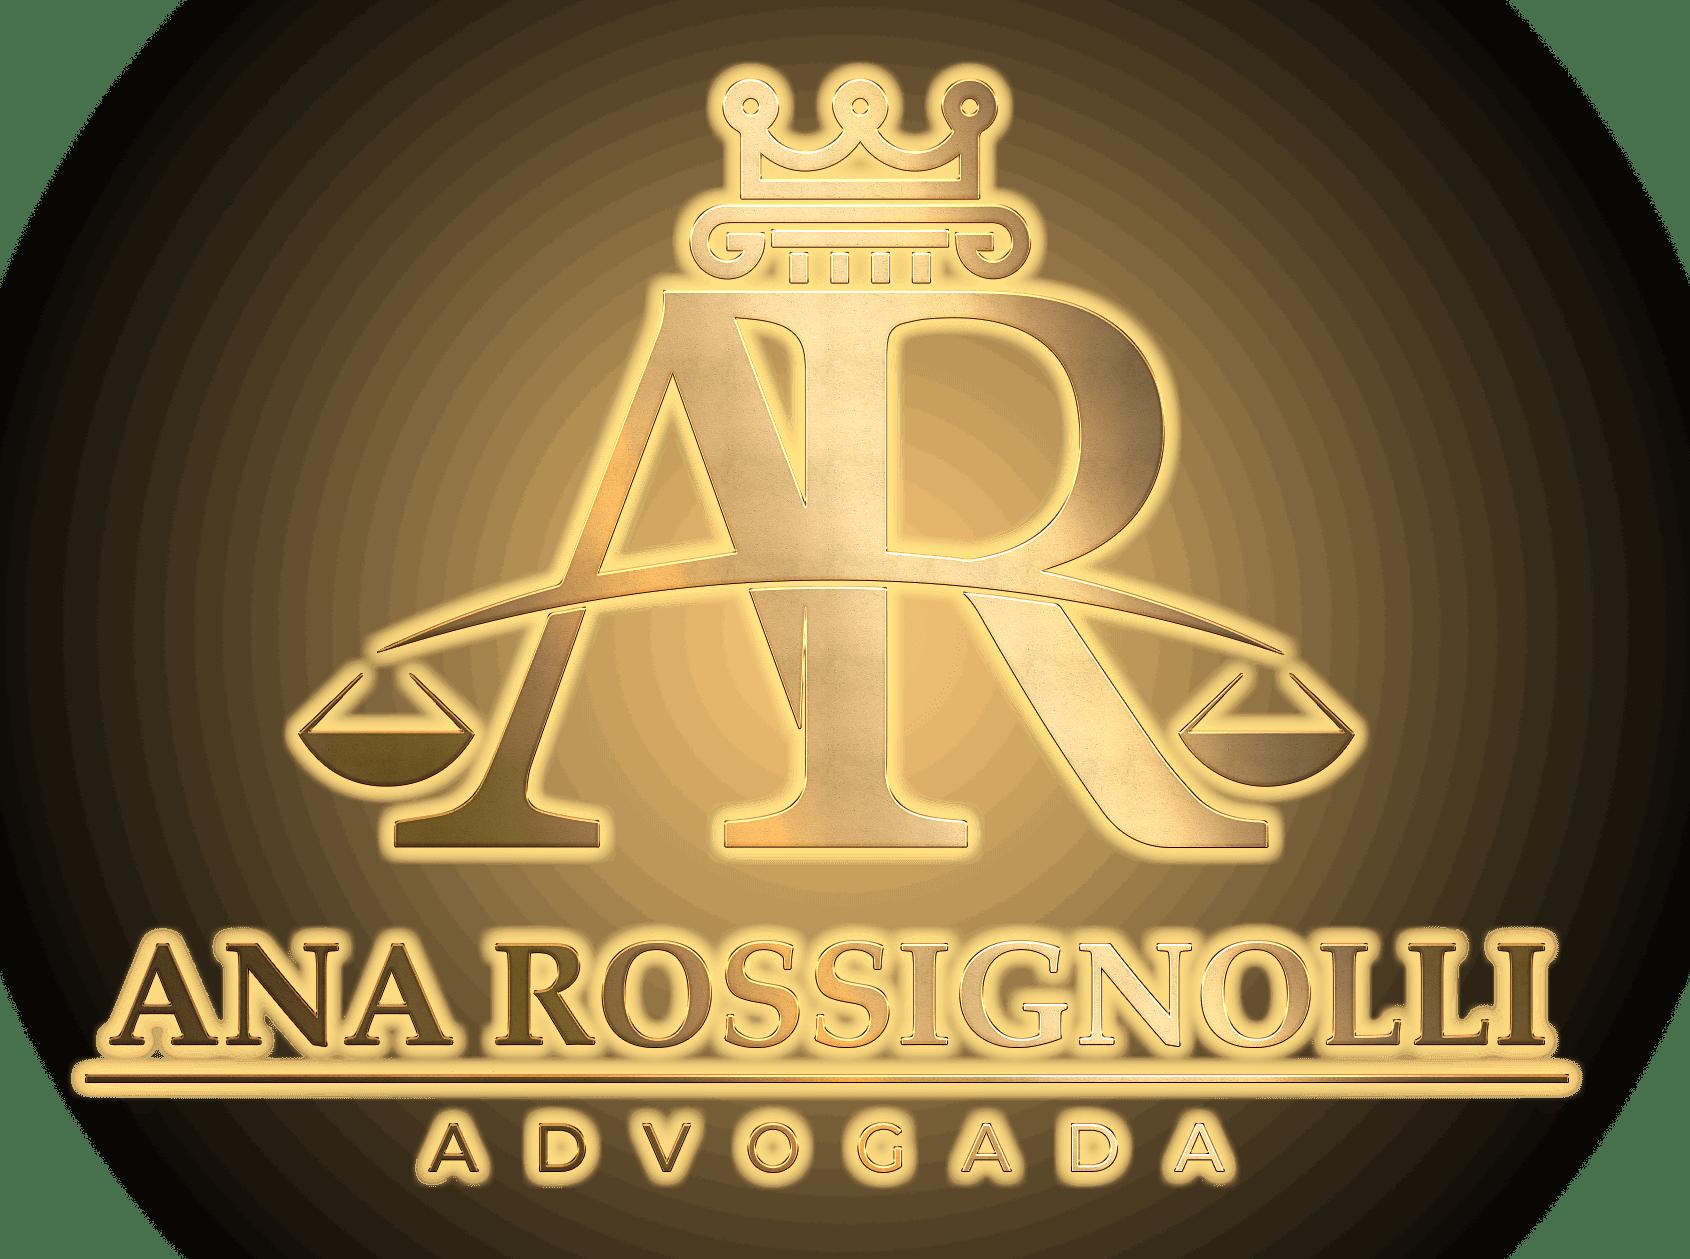 Advogada Ana Rossignolli